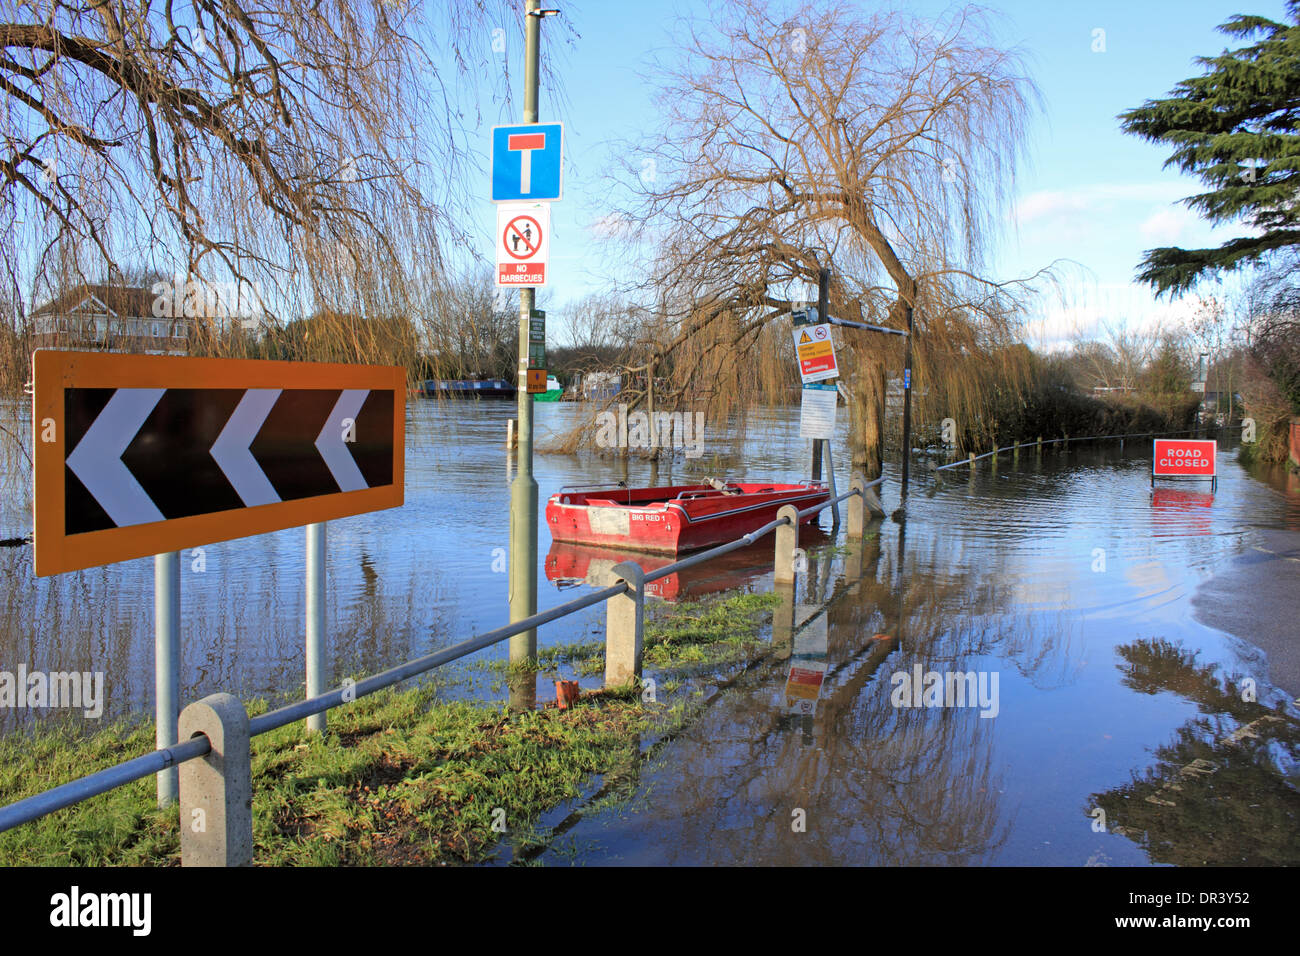 Ferry Lane Laleham, Surrey, England, UK. 19th January 2014. Ferry Lane Laleham is still closed due to flooding. Stock Photo